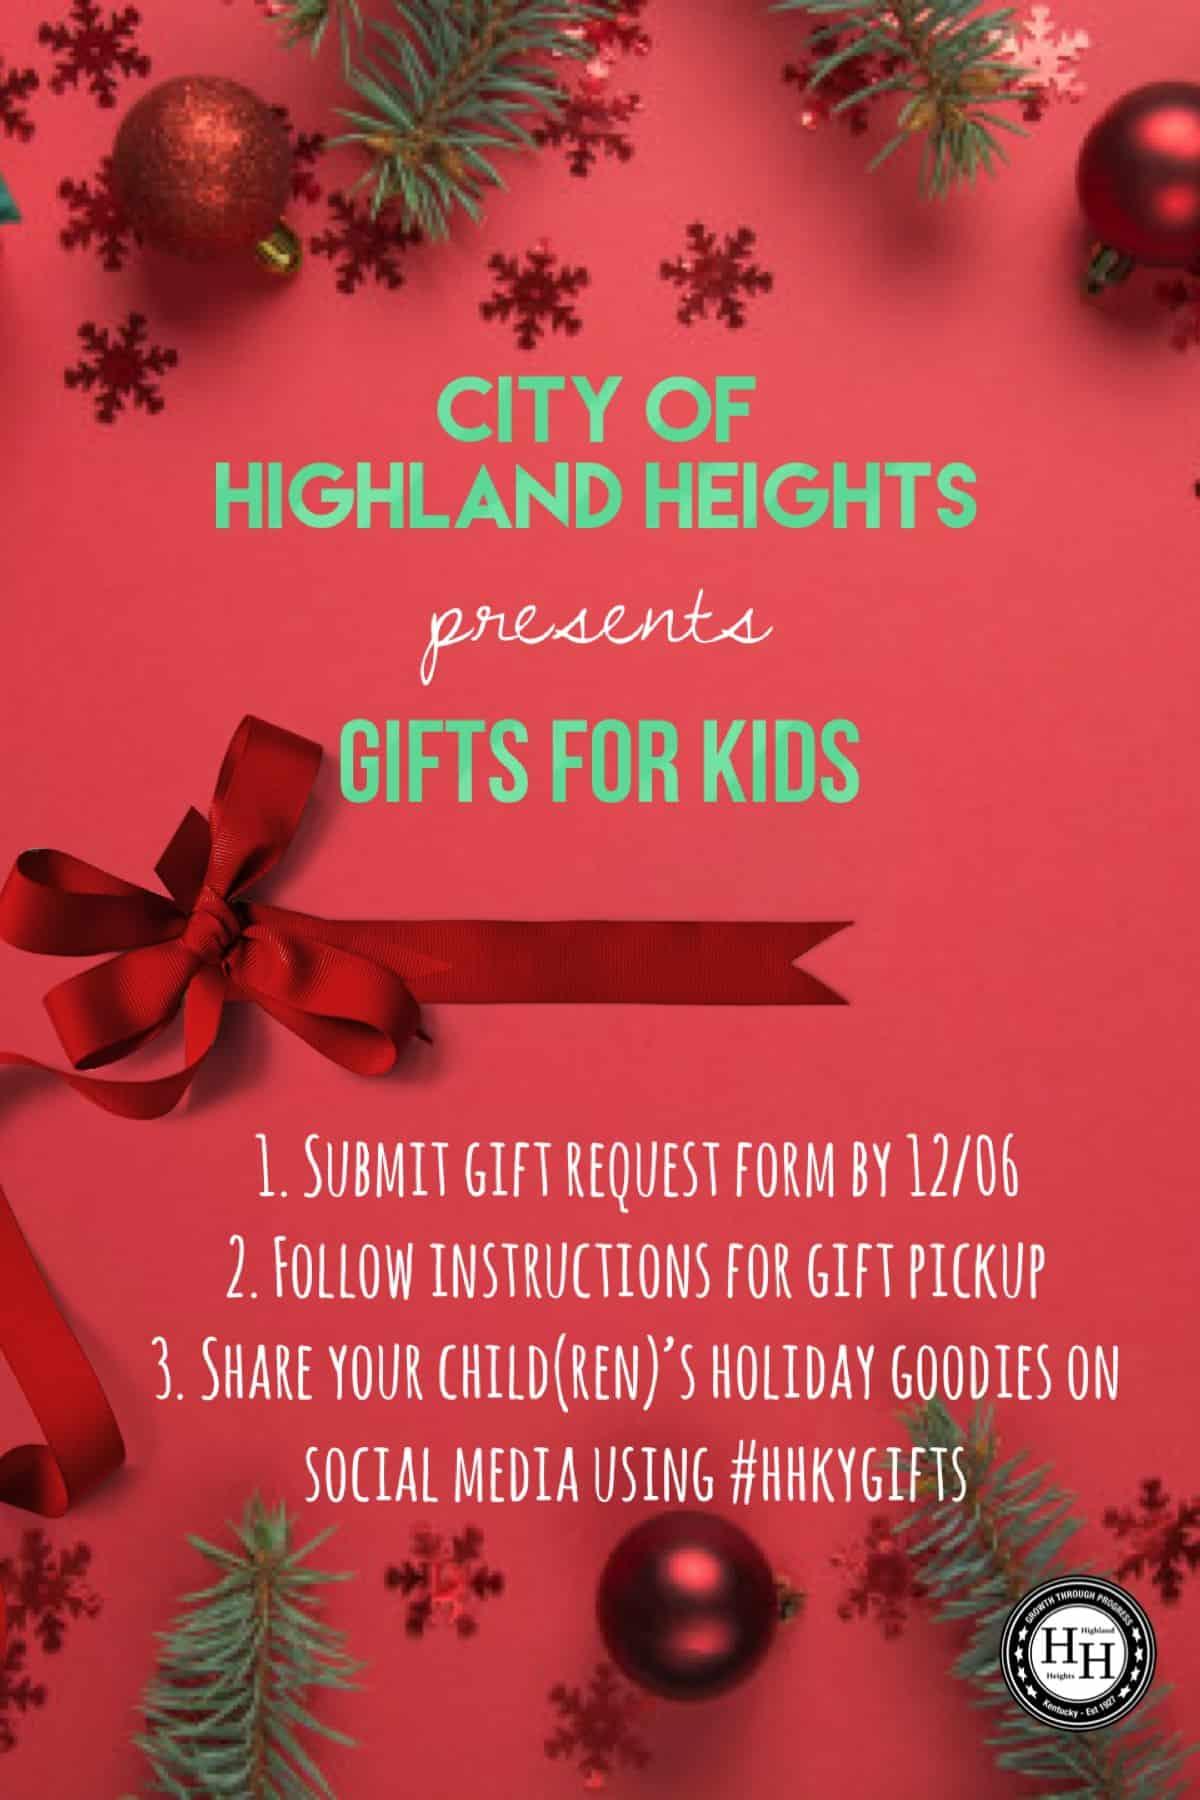 Gifts for Kids - December 12